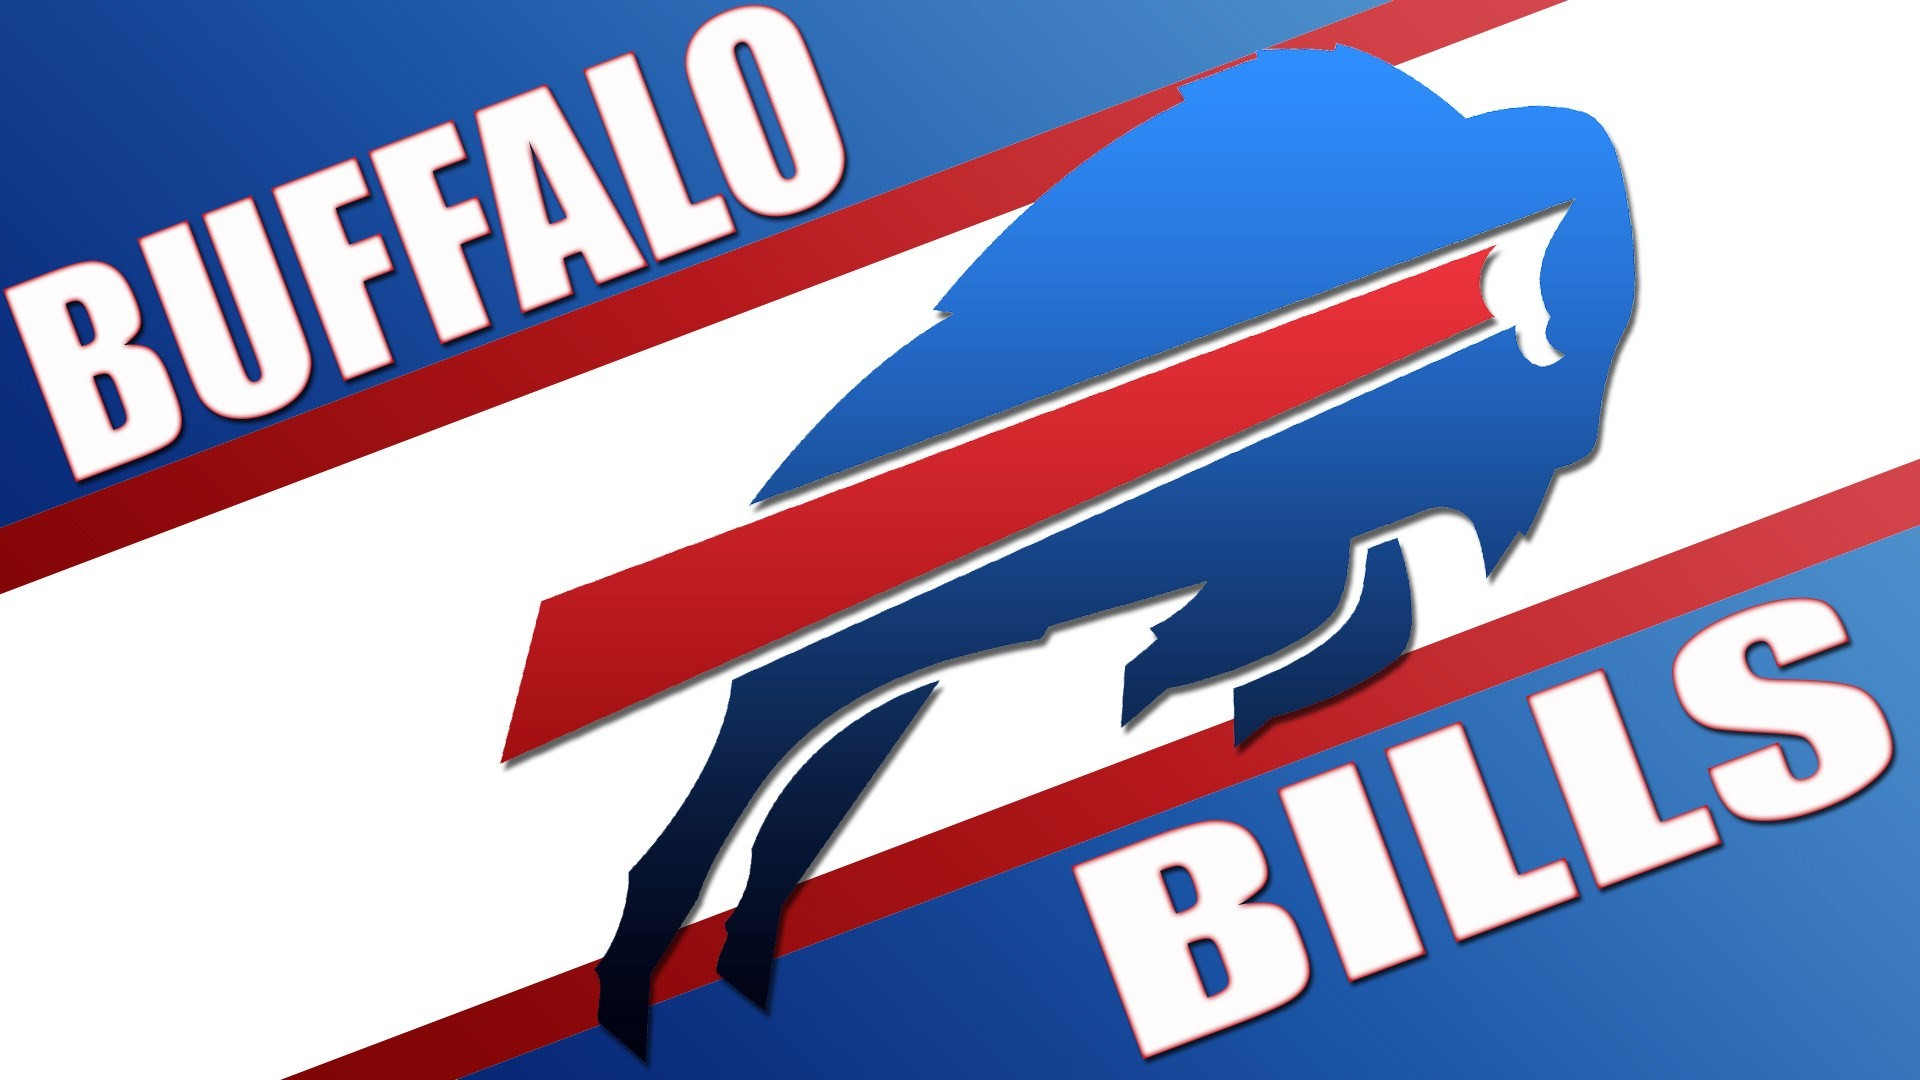 Colter Ross – Best buffalo bills pic – 1920 x 1080 px